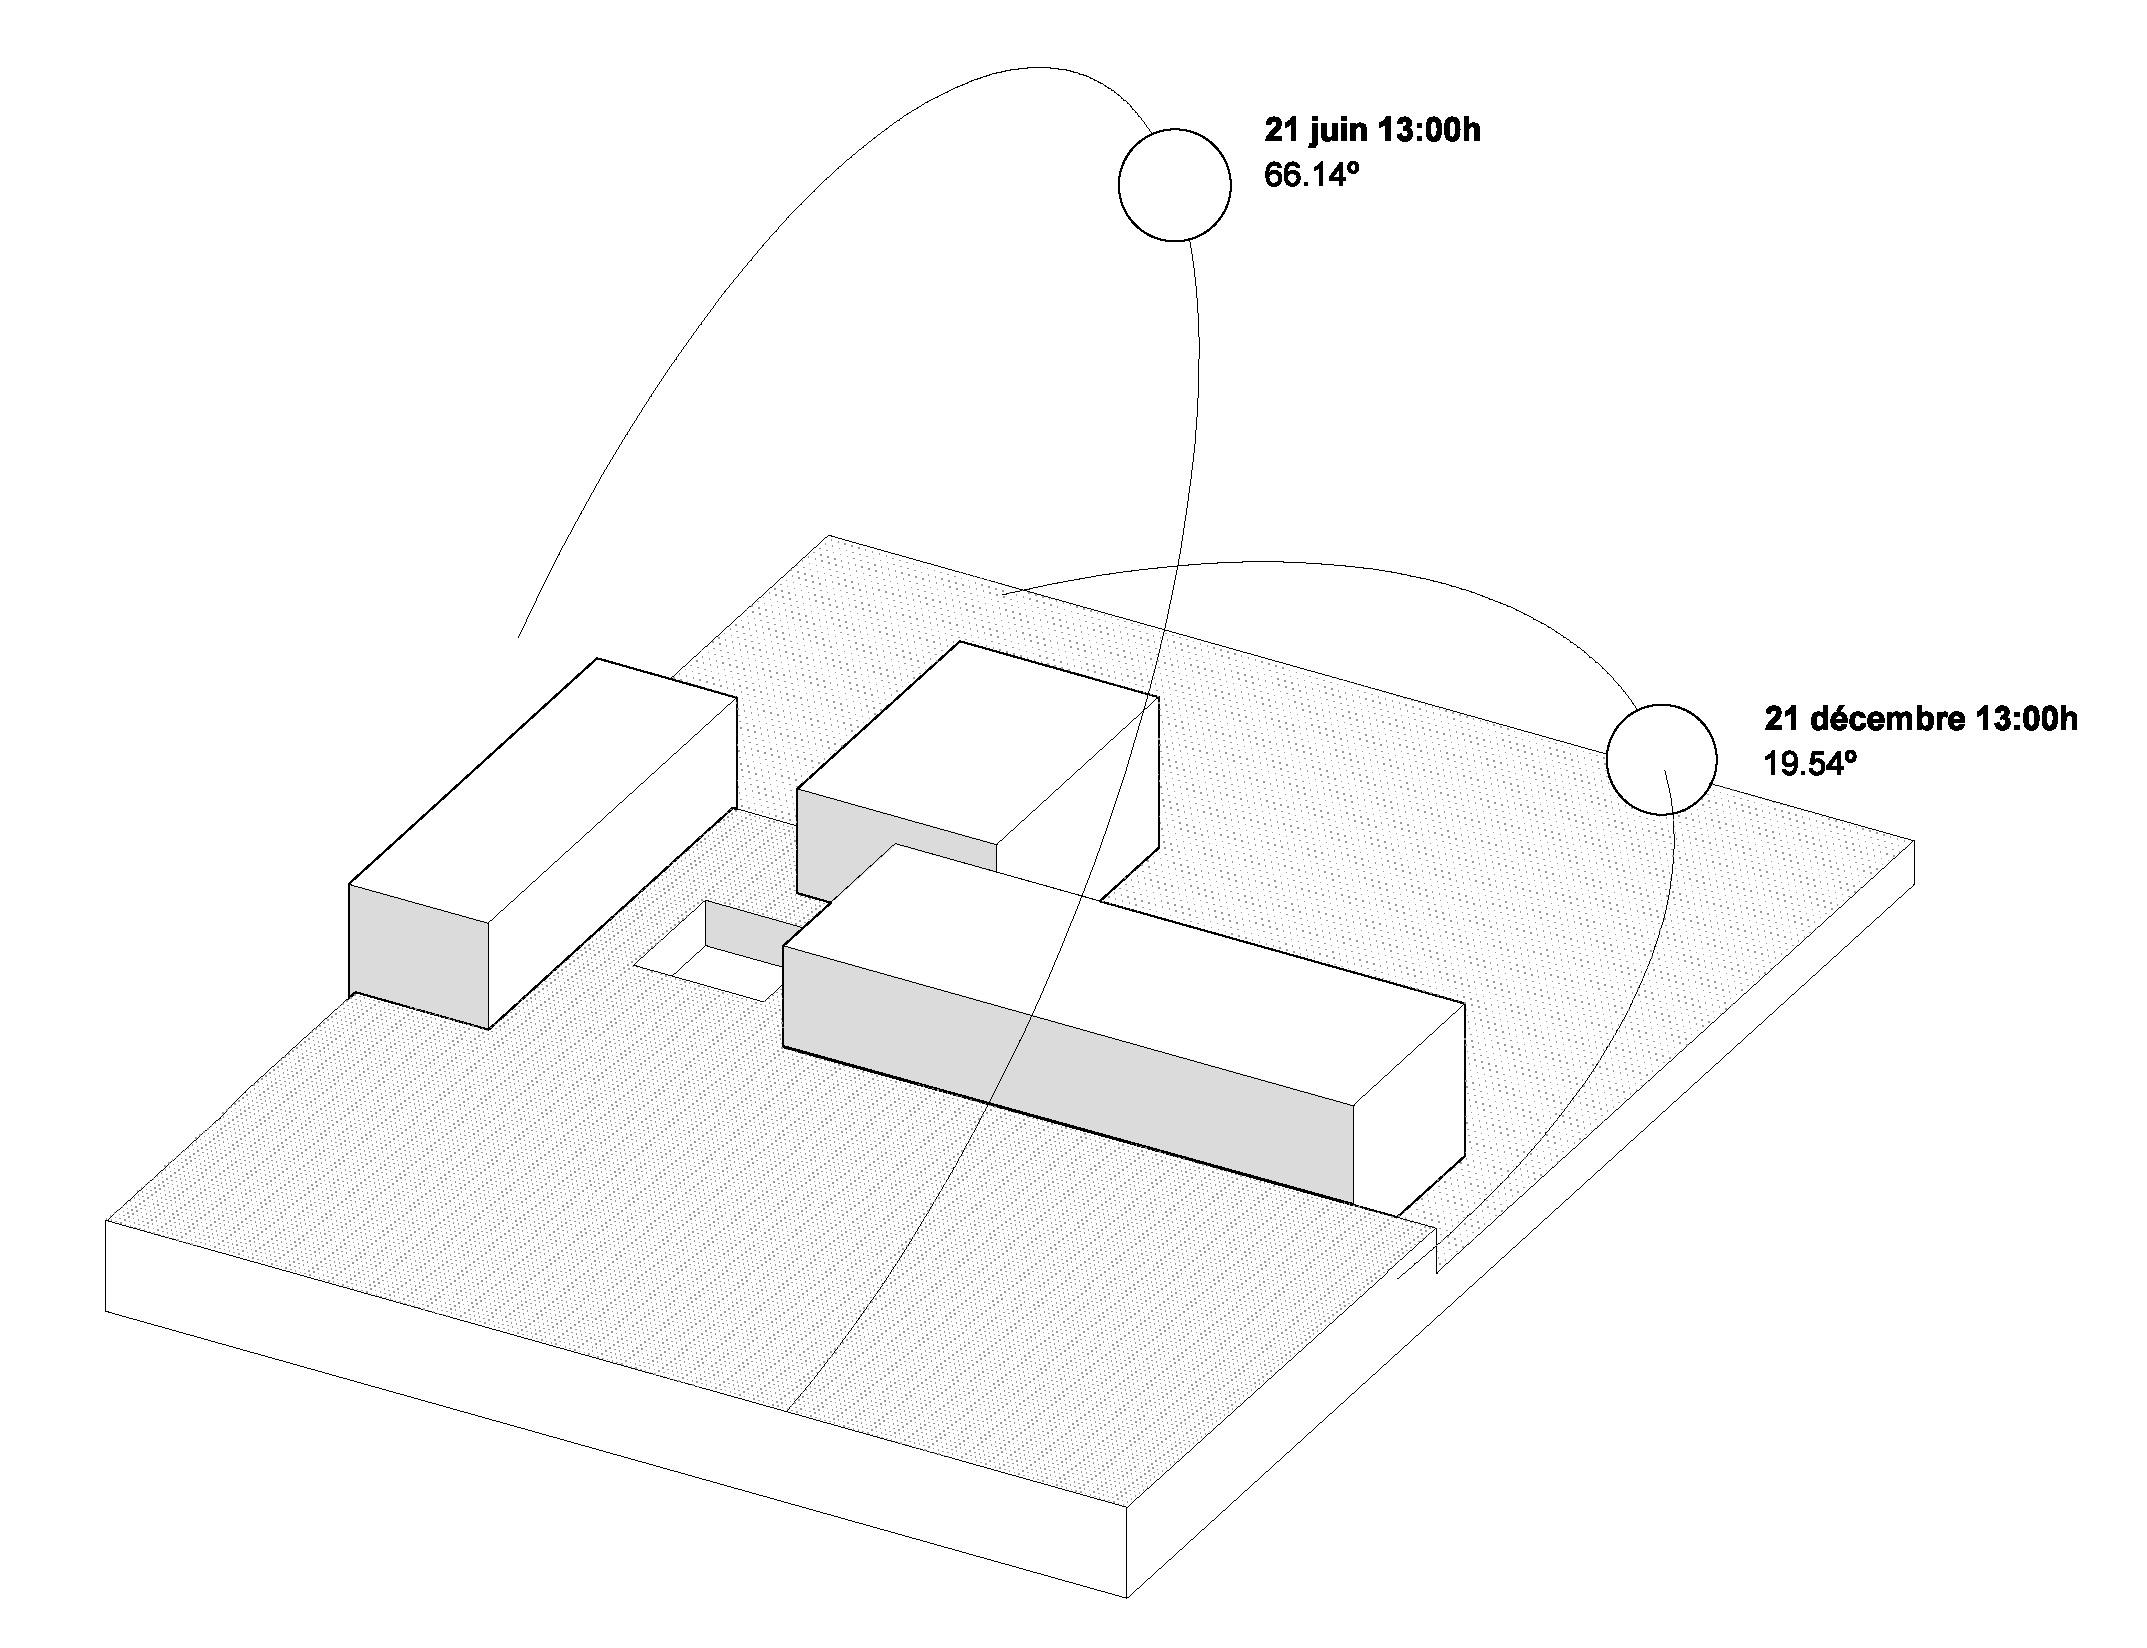 diagramas_clima_fases.jpg